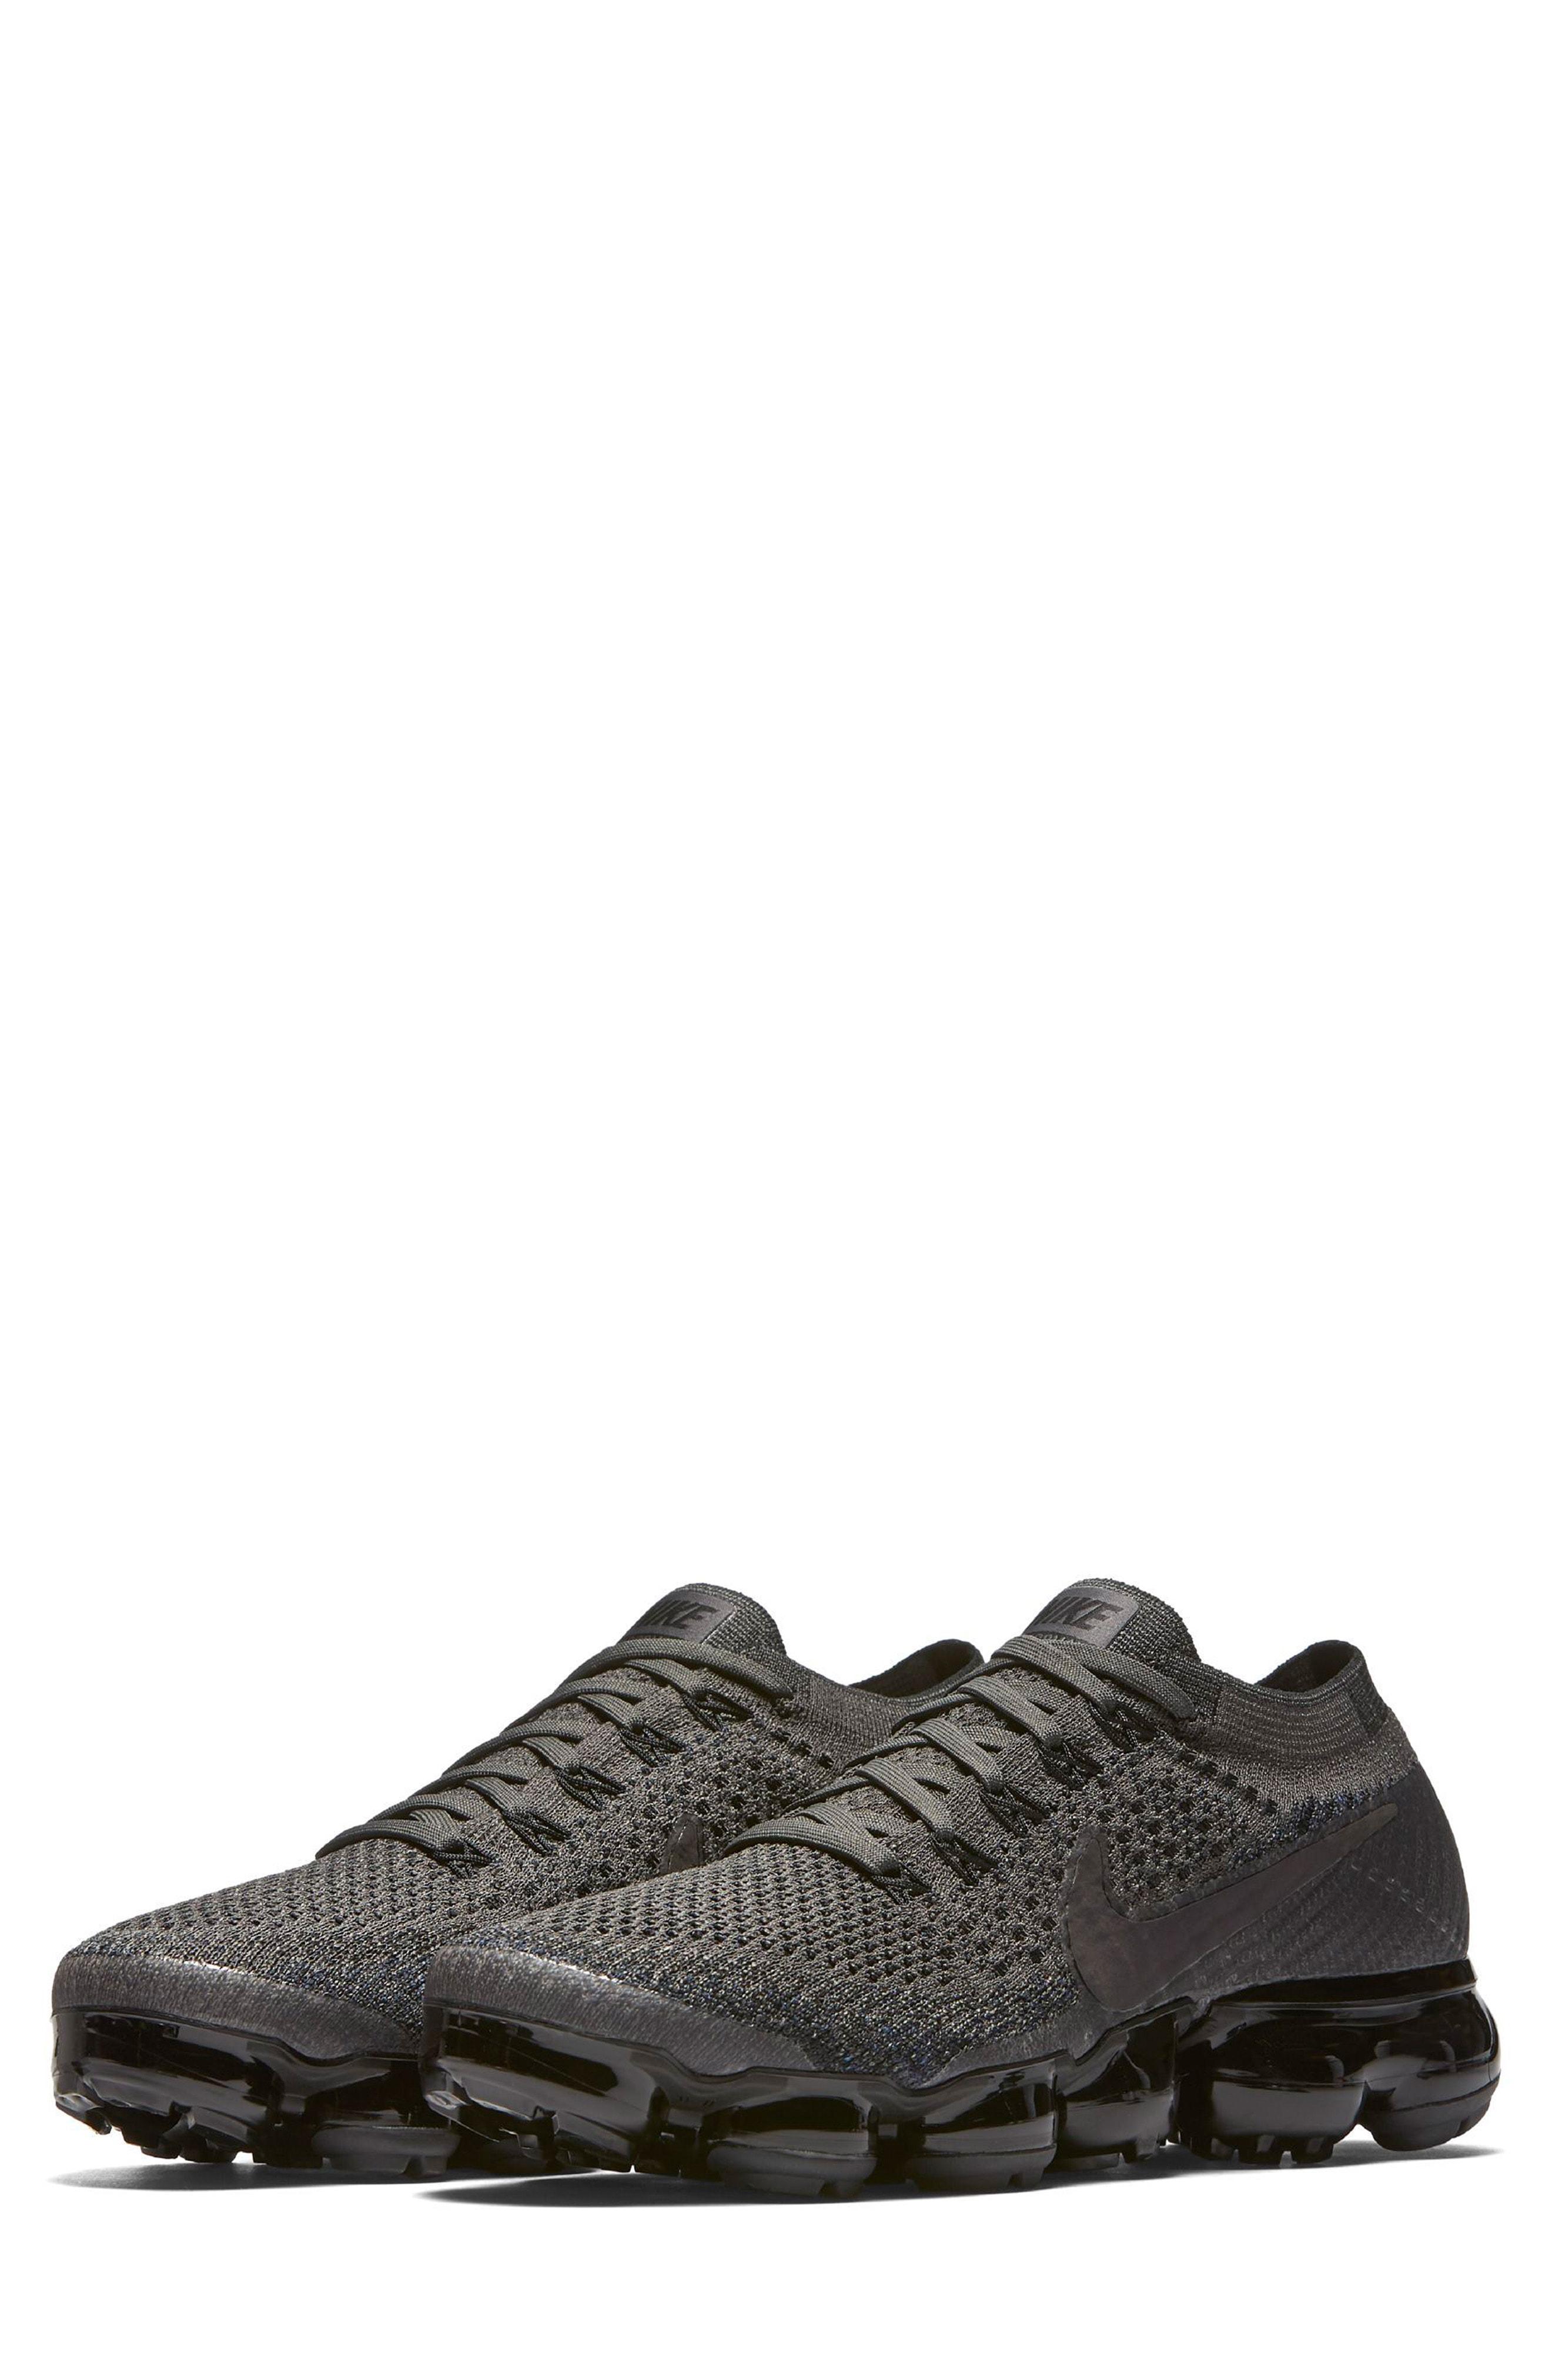 acb6ff15be Nike Air Vapormax Flyknit Running Shoe In Midnight Fog/ Black | ModeSens